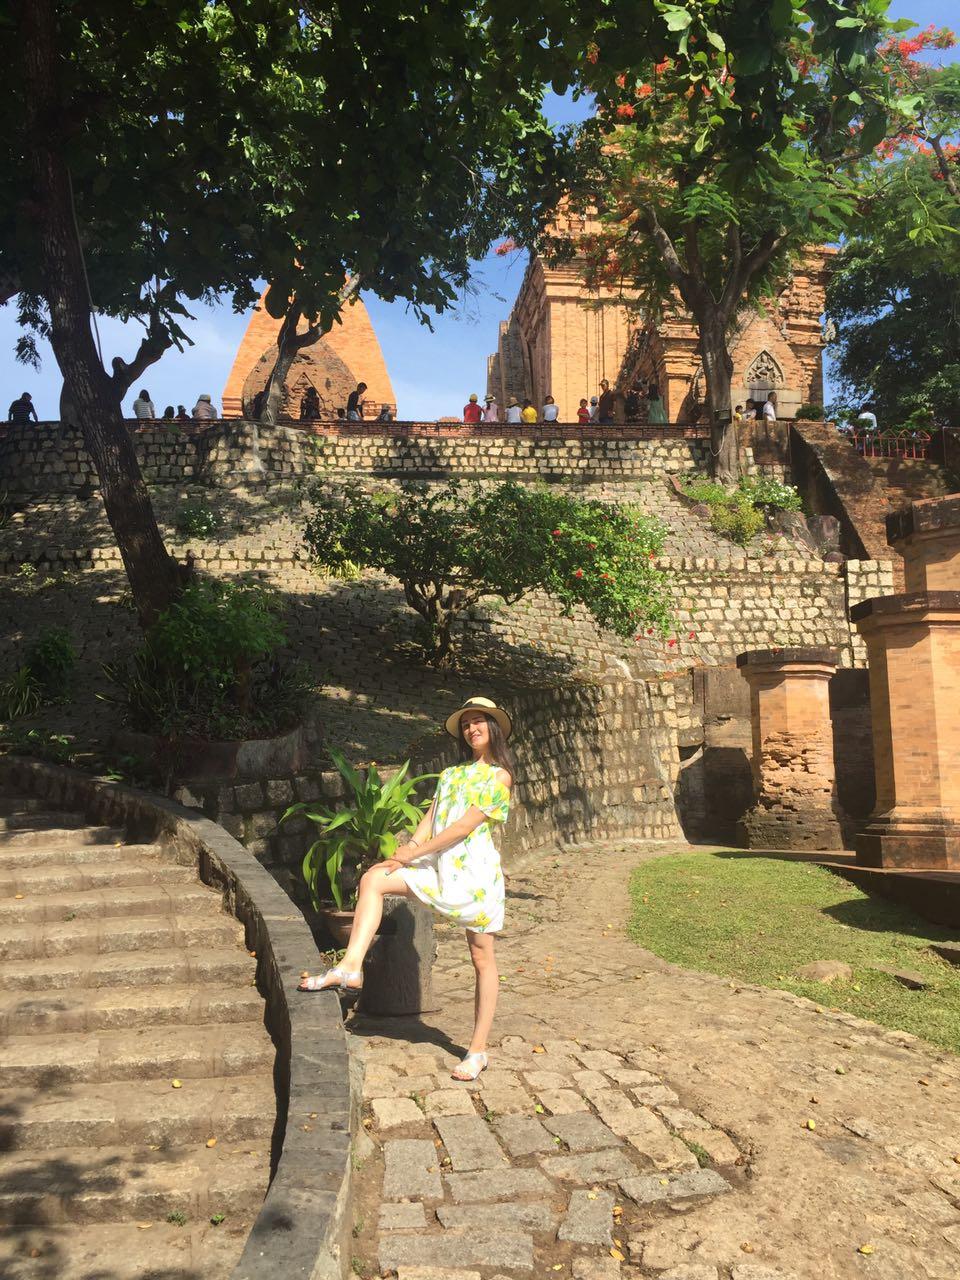 Нячанг, Вьетнам. Привет из отпуска!